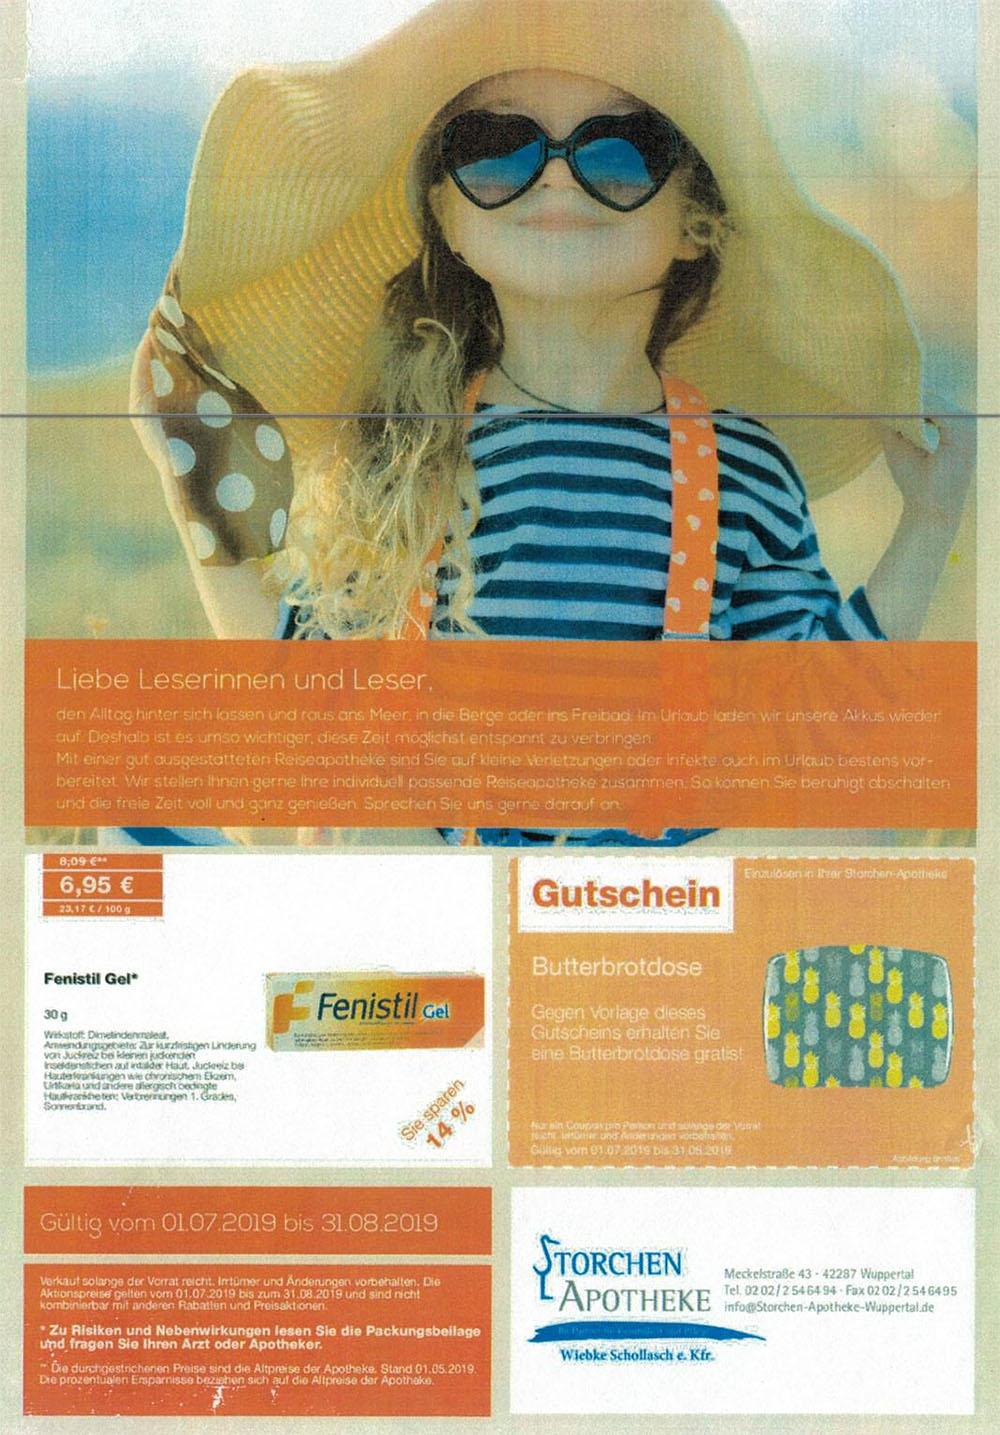 http://www.apotheken.de/fileadmin/clubarea/00000-Angebote/42277_kreuz_angebot_1.jpg